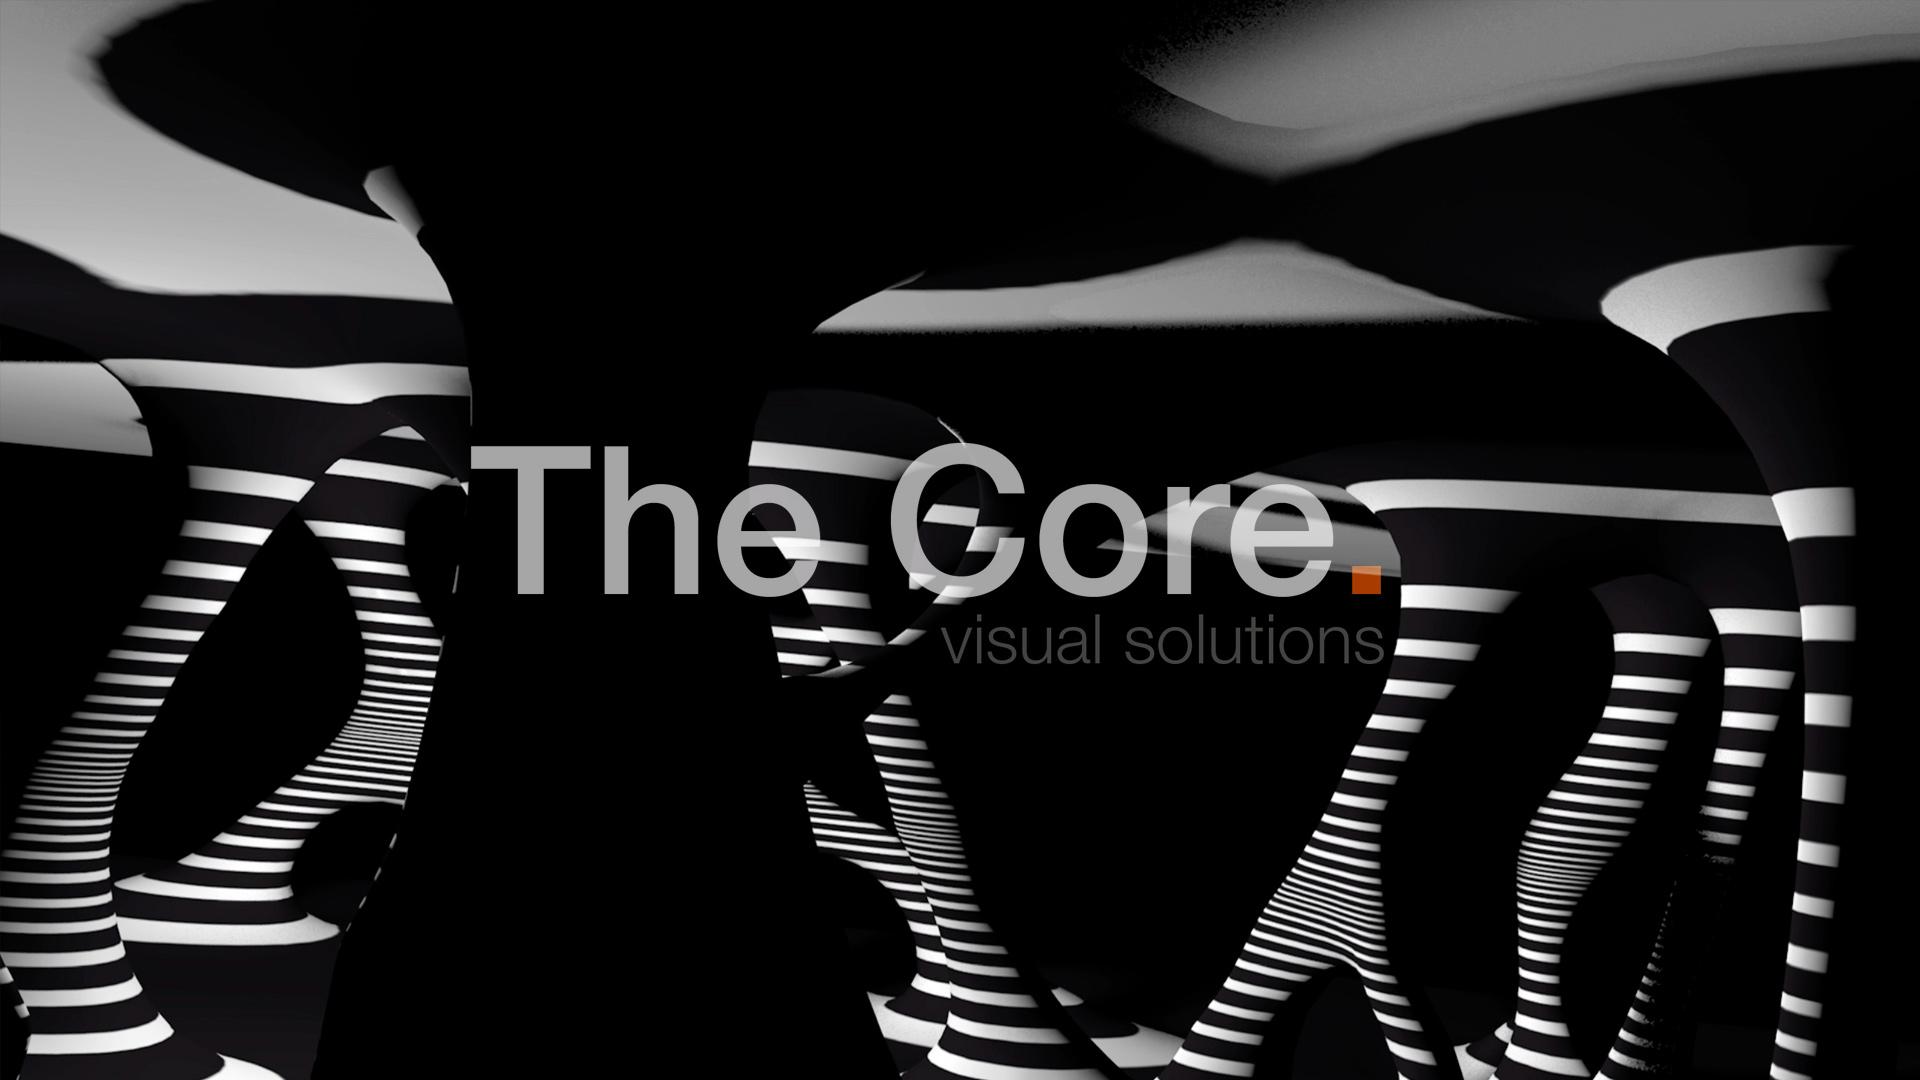 00234-PILLARS-6-STILL-by-The-Core